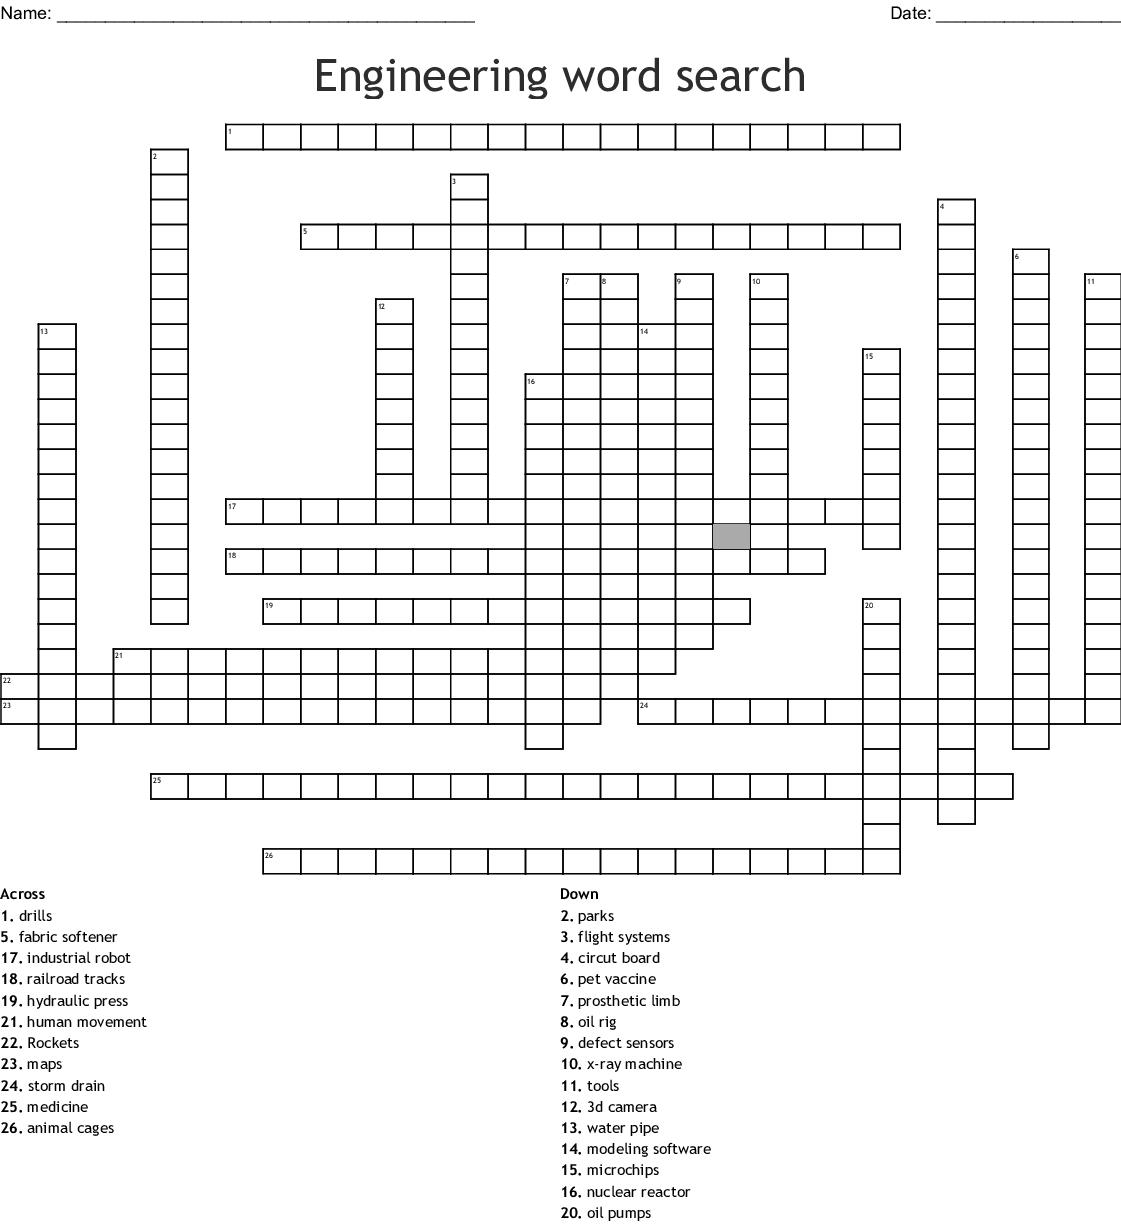 Engineering Word Search Crossword